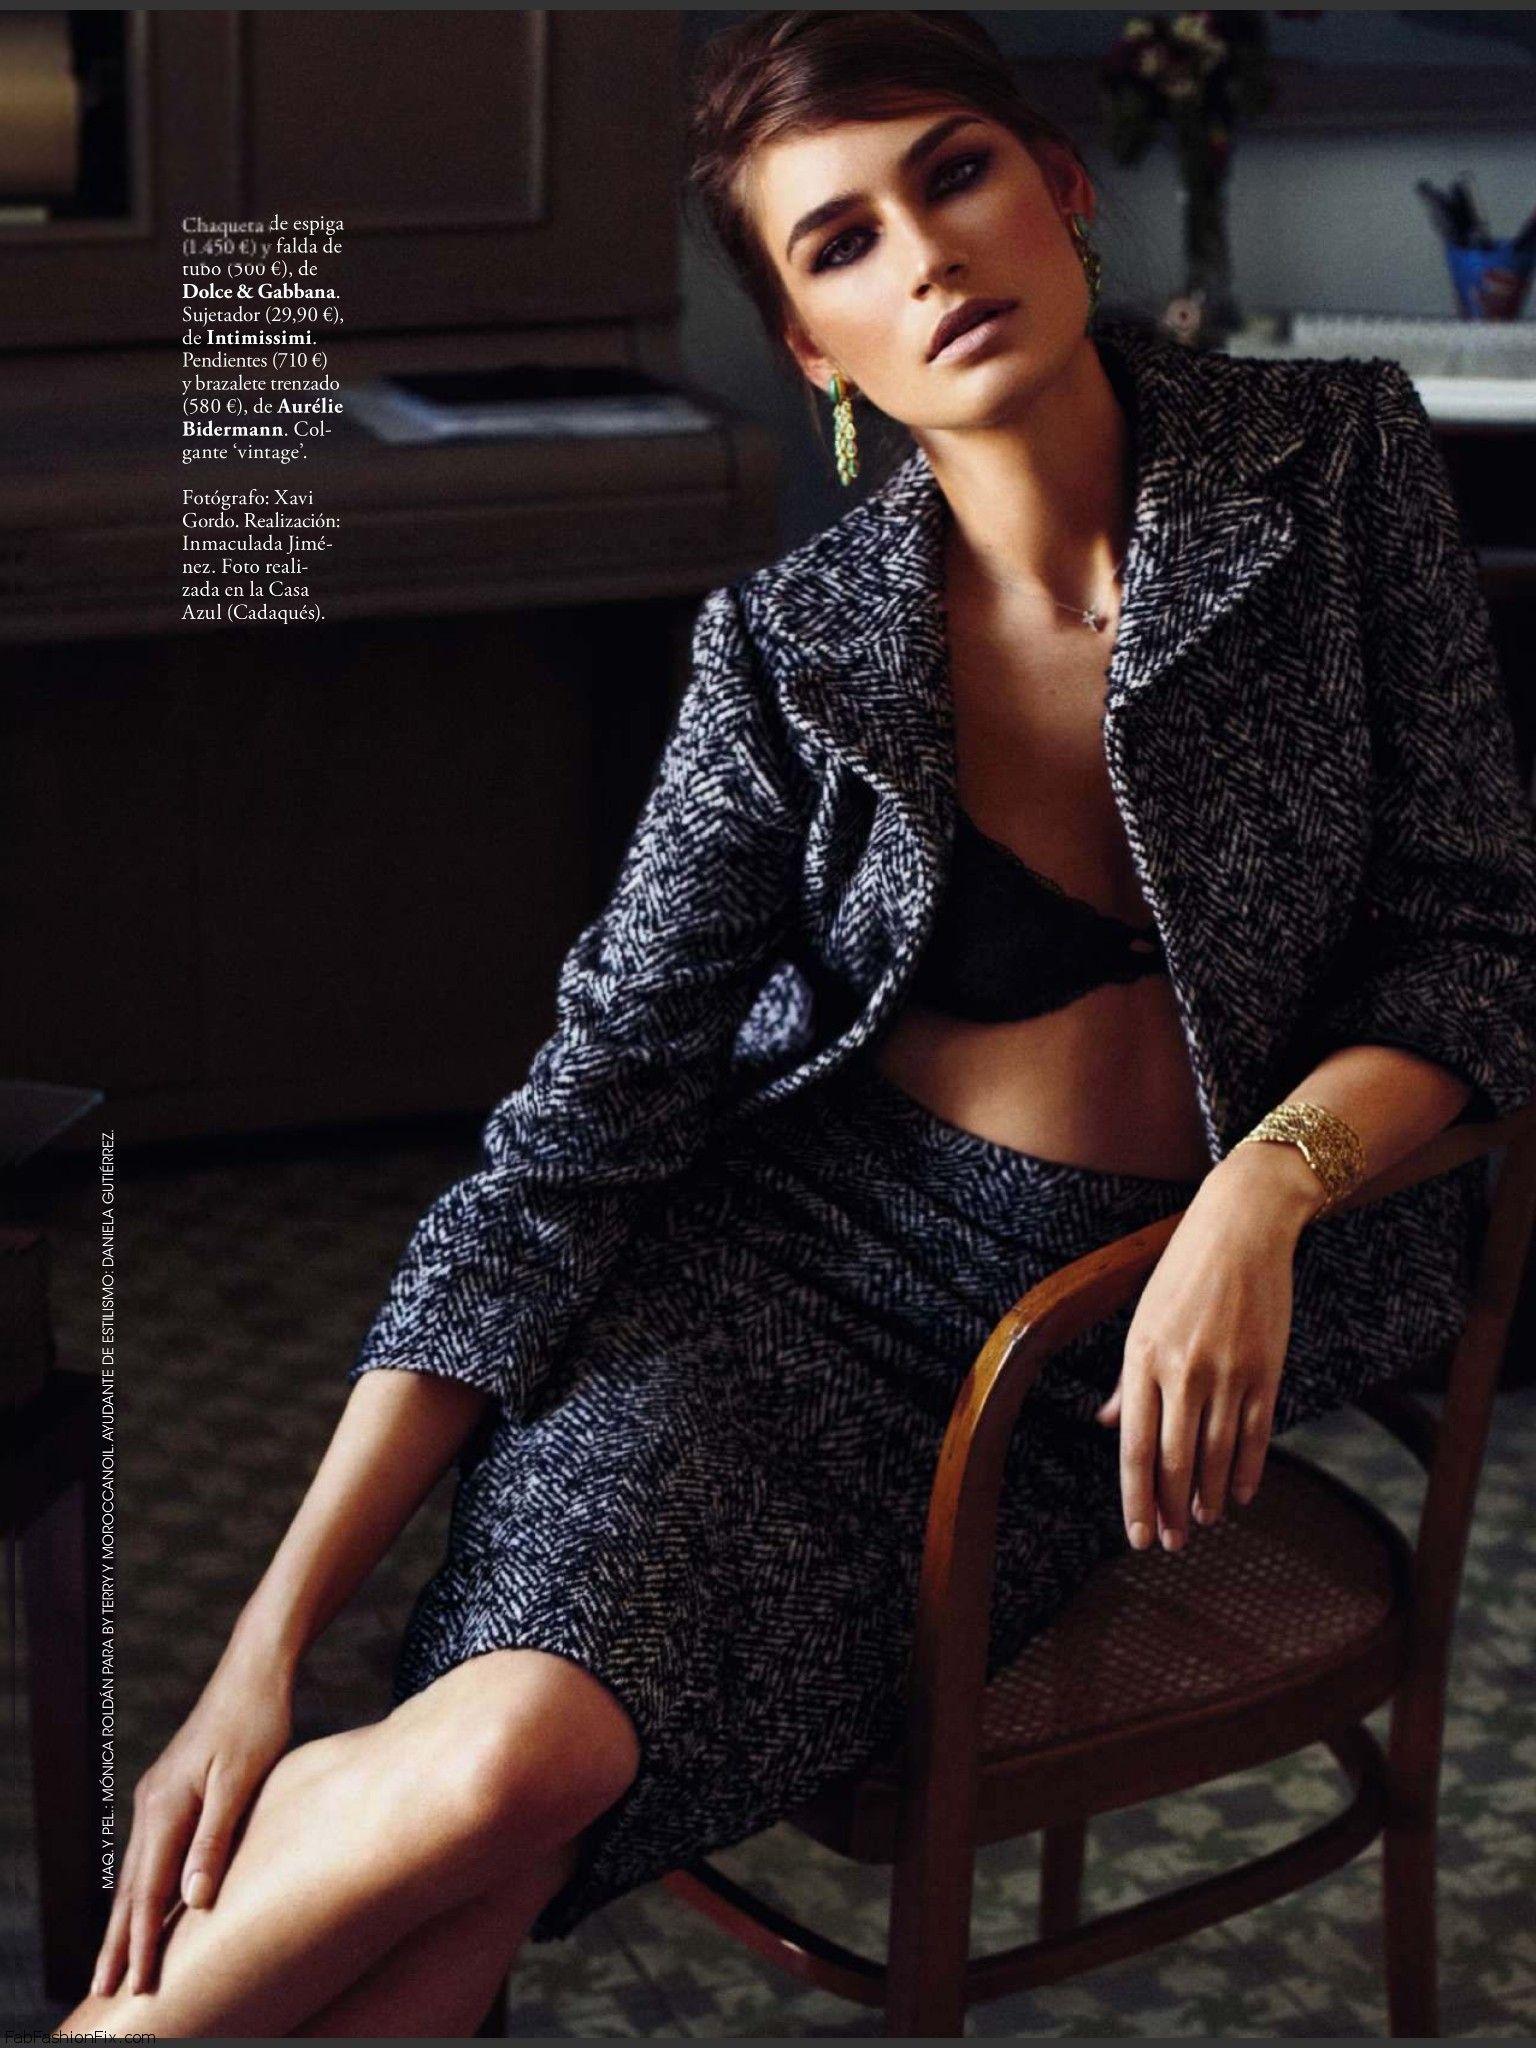 fashion_scans_remastered-eugenia_volodina-elle_espana-september_2013-scanned_by_vampirehorde-hq-11